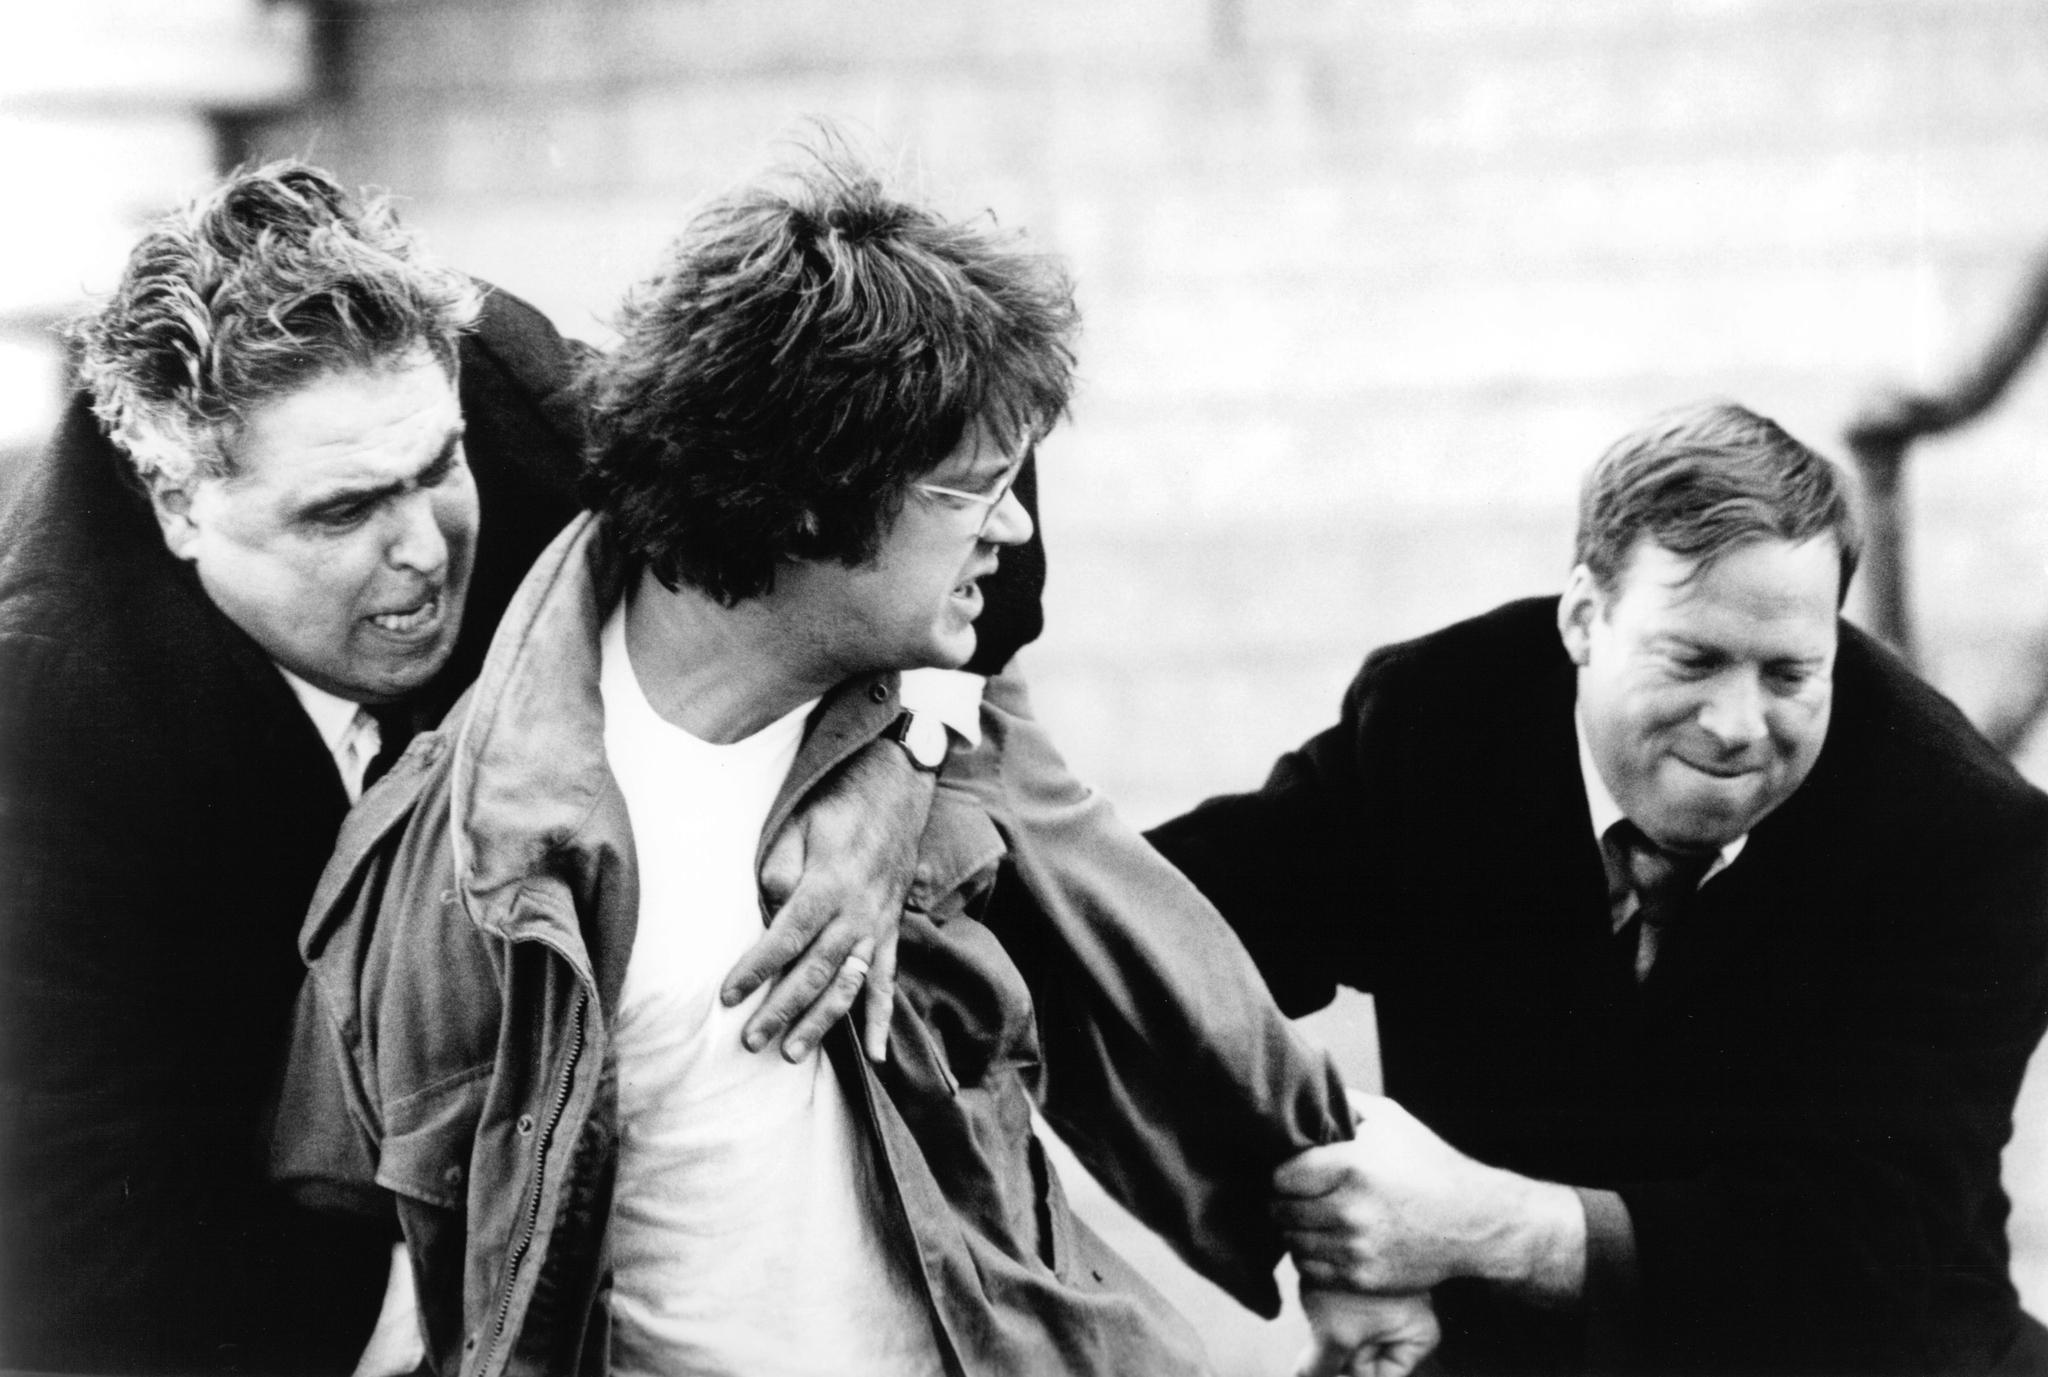 Tim Robbins, John Capodice, and John Patrick McLaughlin in Jacob's Ladder (1990)